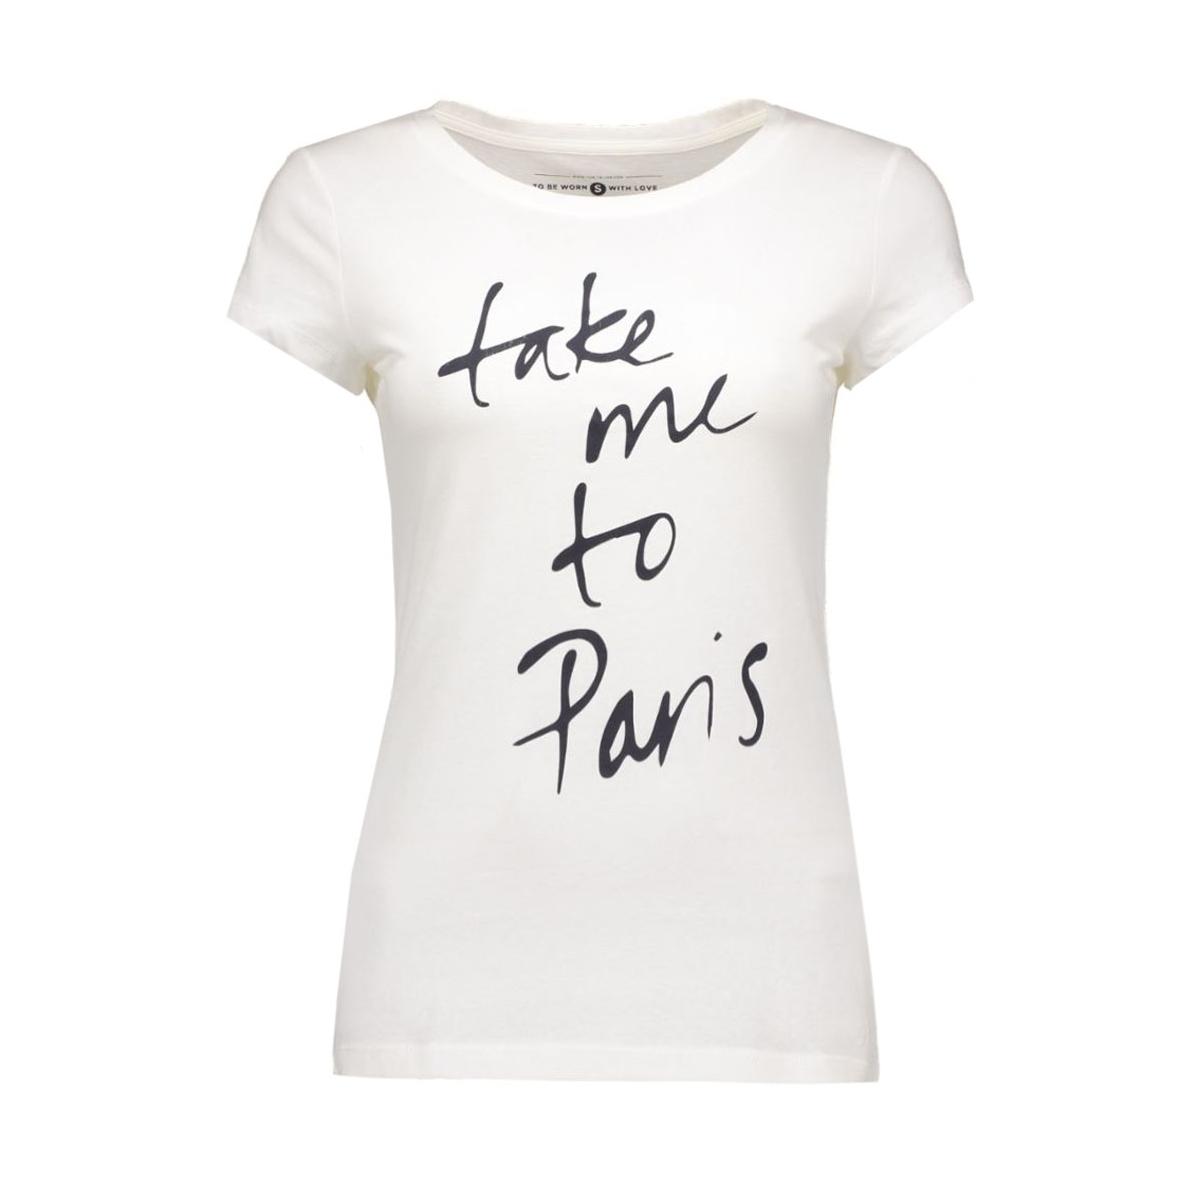 1035523.01.71 tom tailor t-shirt 8005